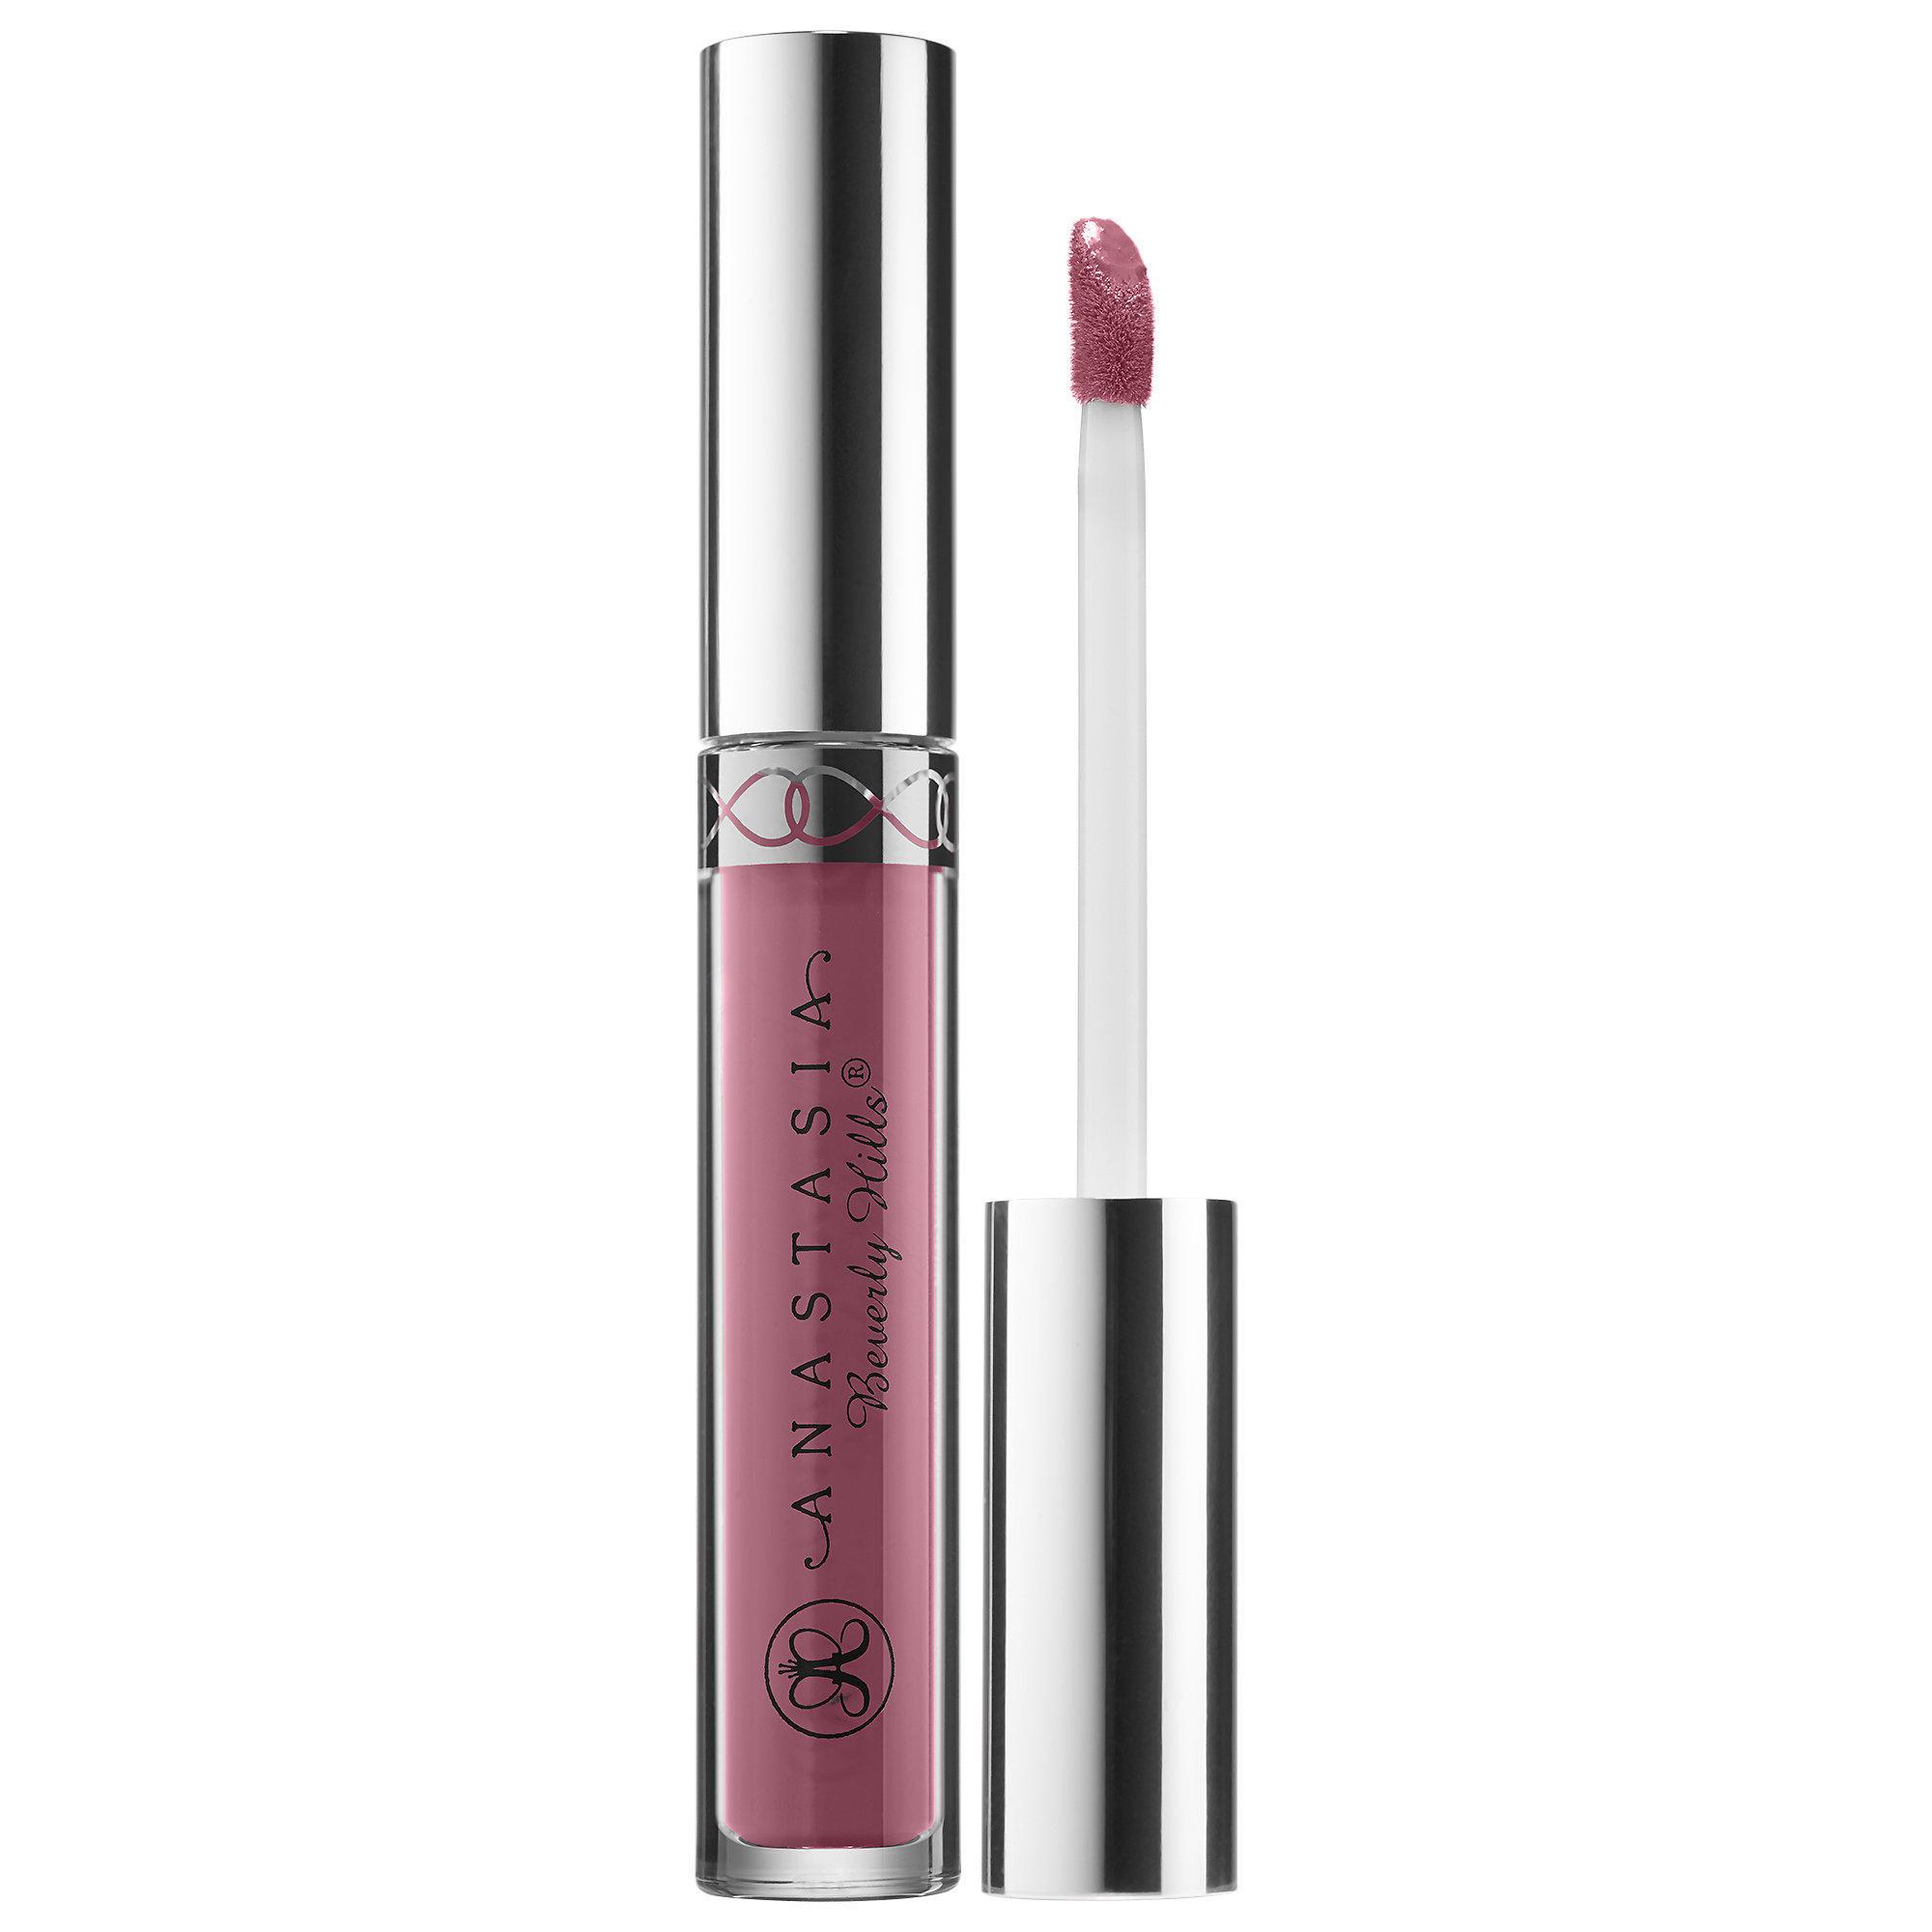 Anastasia Liquid Lipstick Dazed Mini